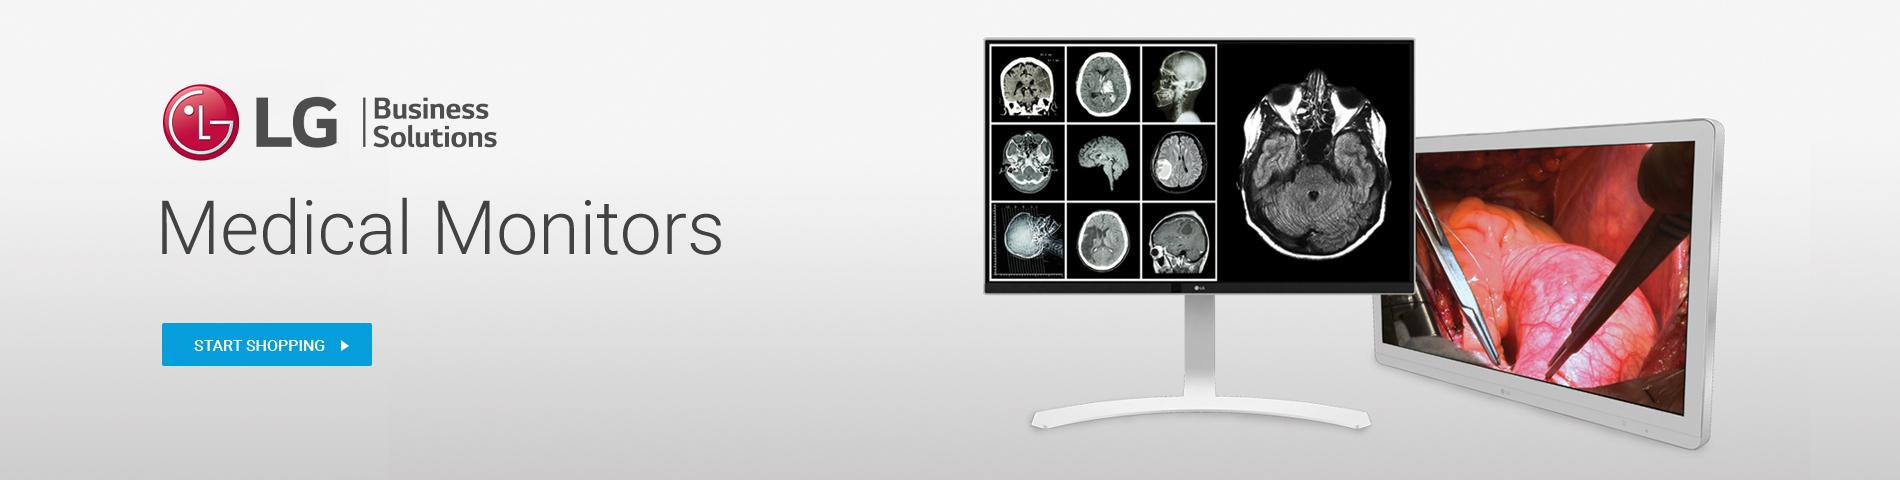 LG Medical Monitors